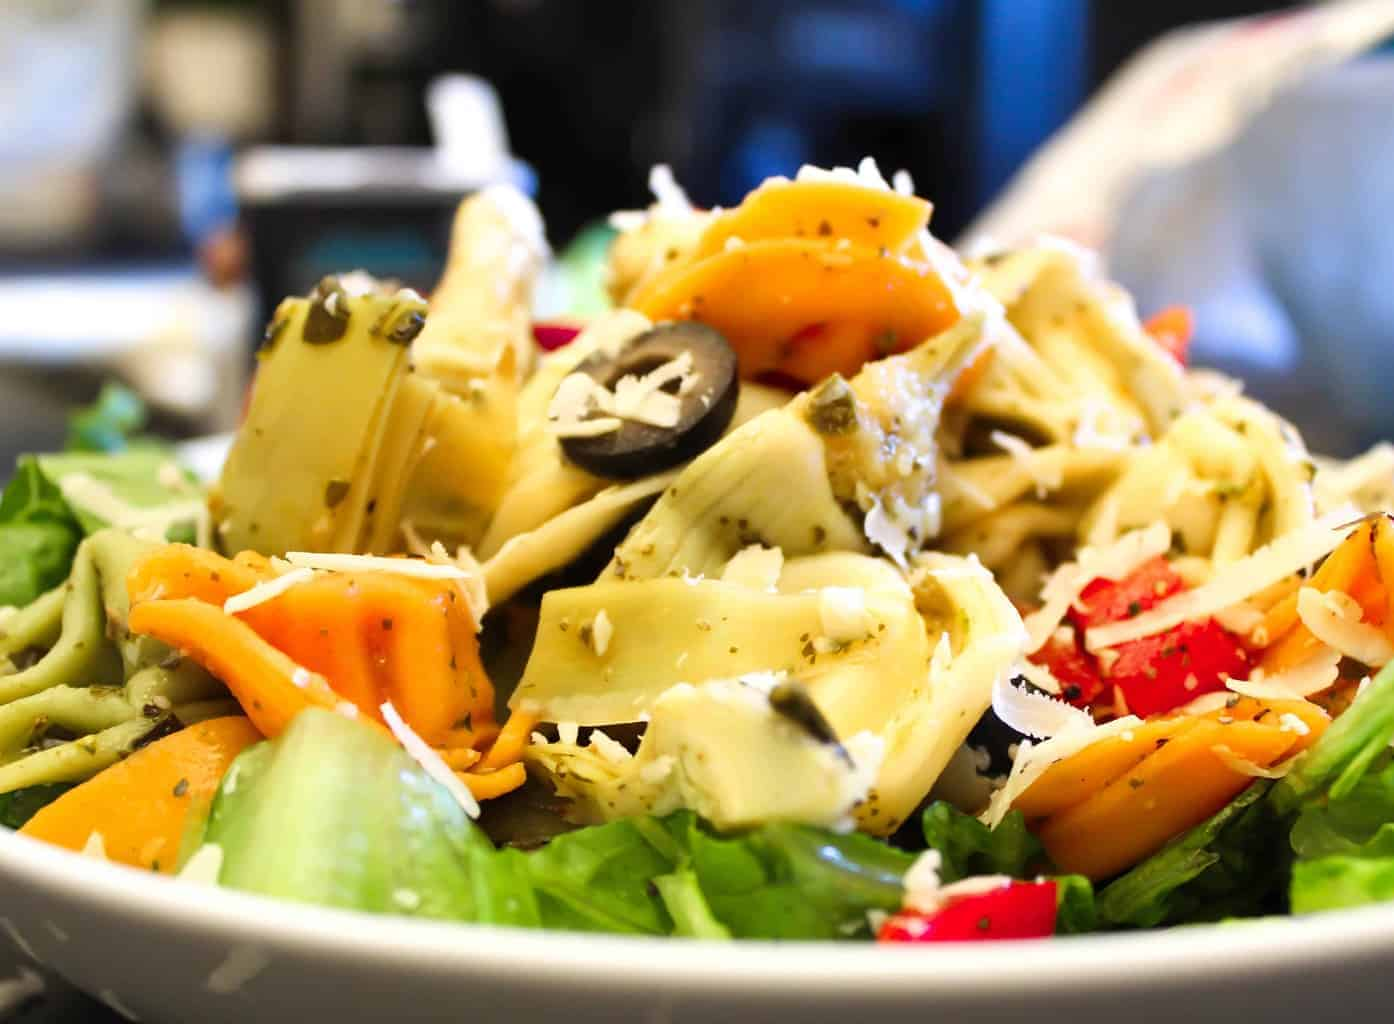 Tortellini Pasta Salad garnished with shredded mozzarella cheese